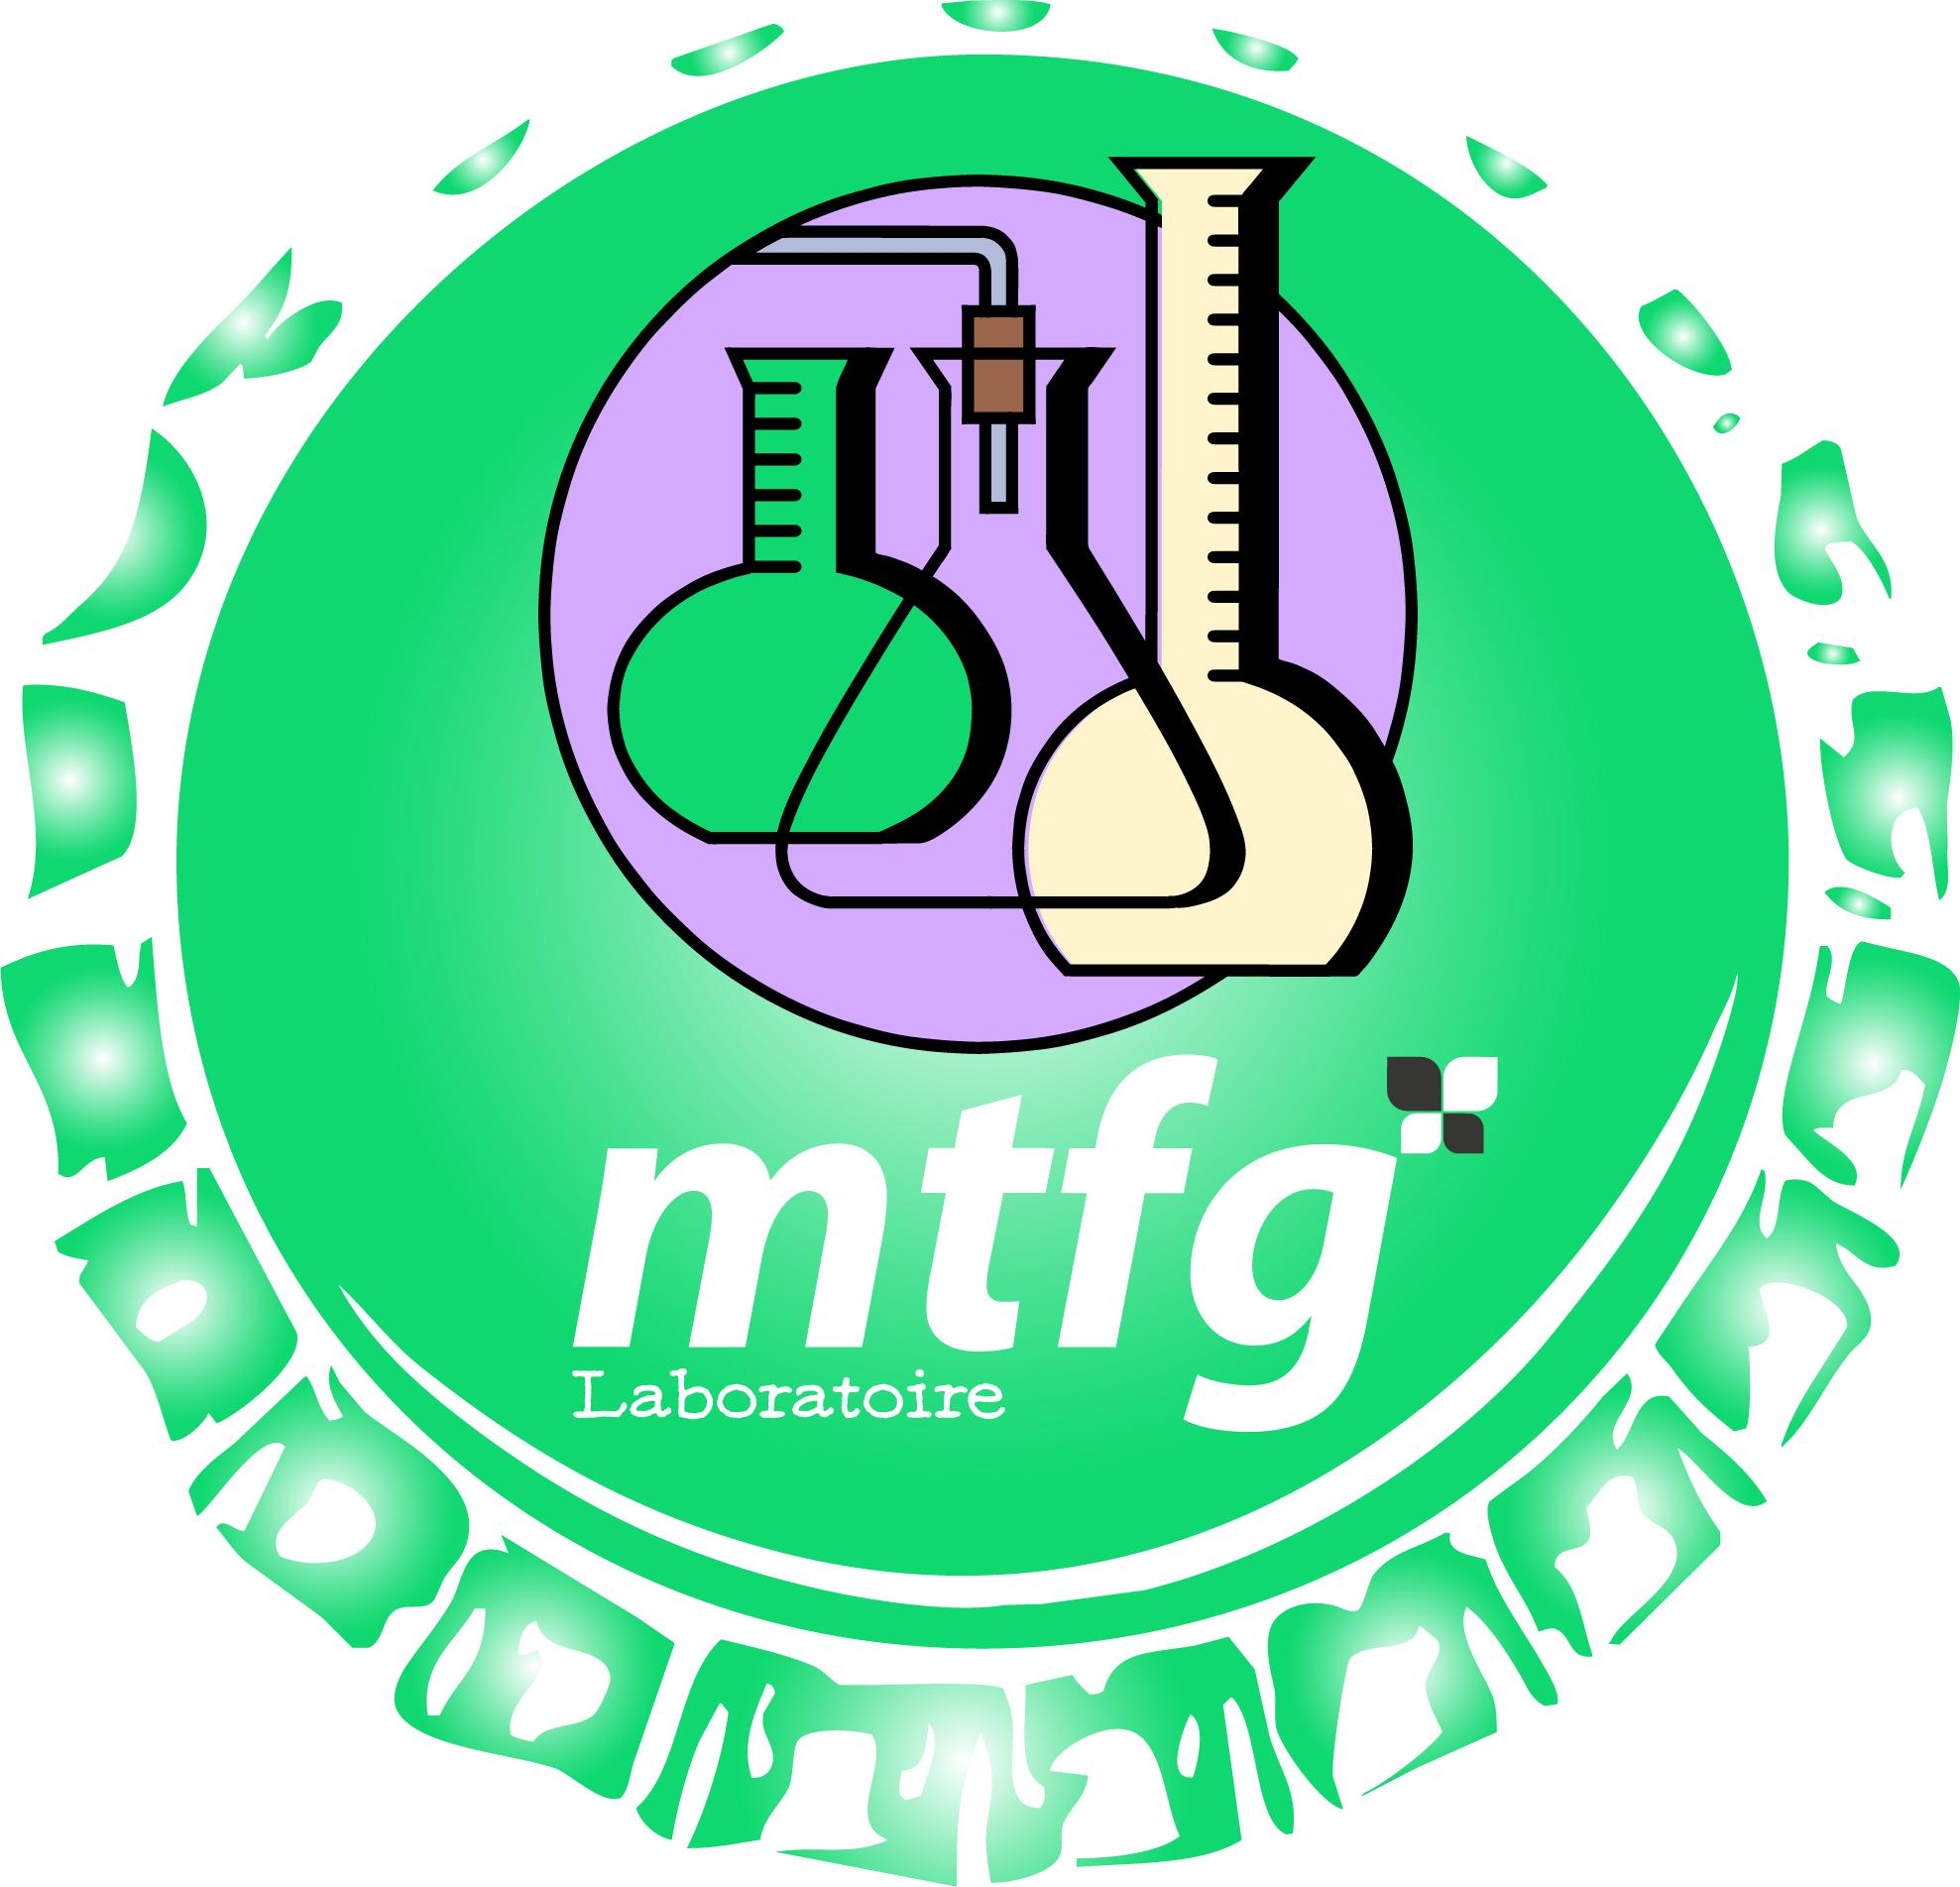 MTFG Laboratoire